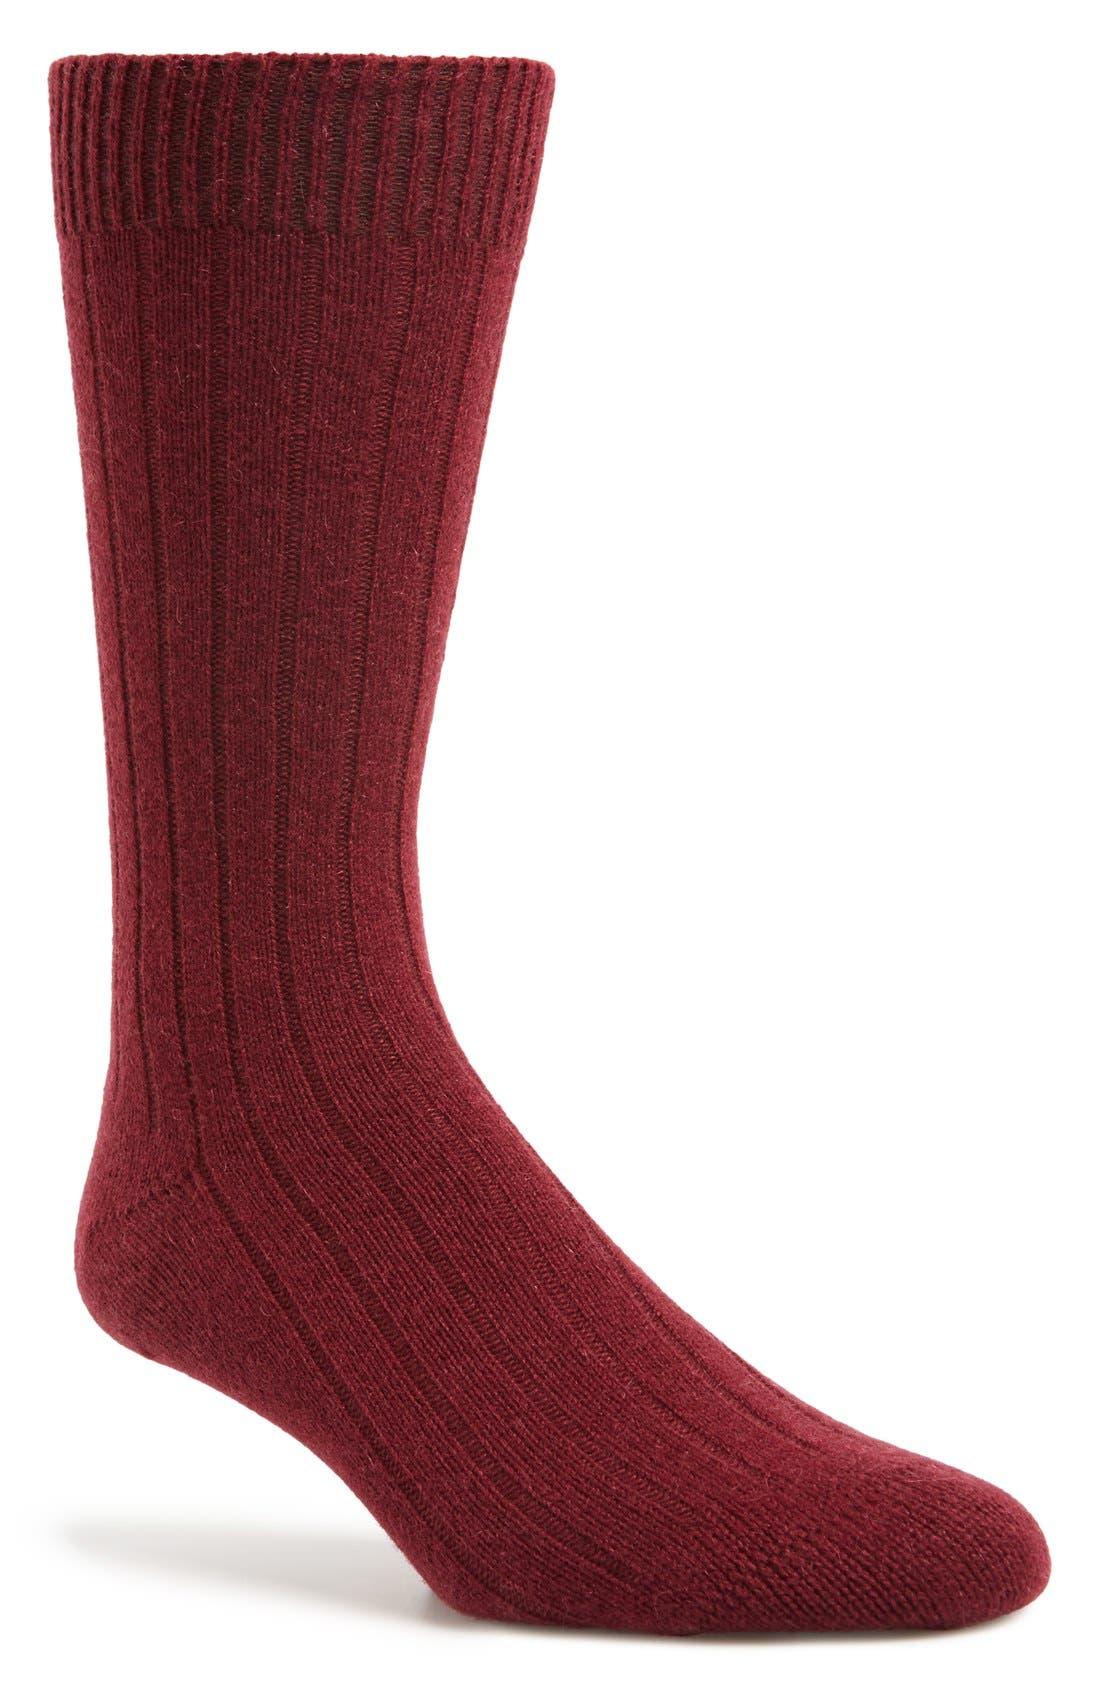 'Waddington' Cashmere Blend Mid Calf Socks,                             Main thumbnail 1, color,                             Port